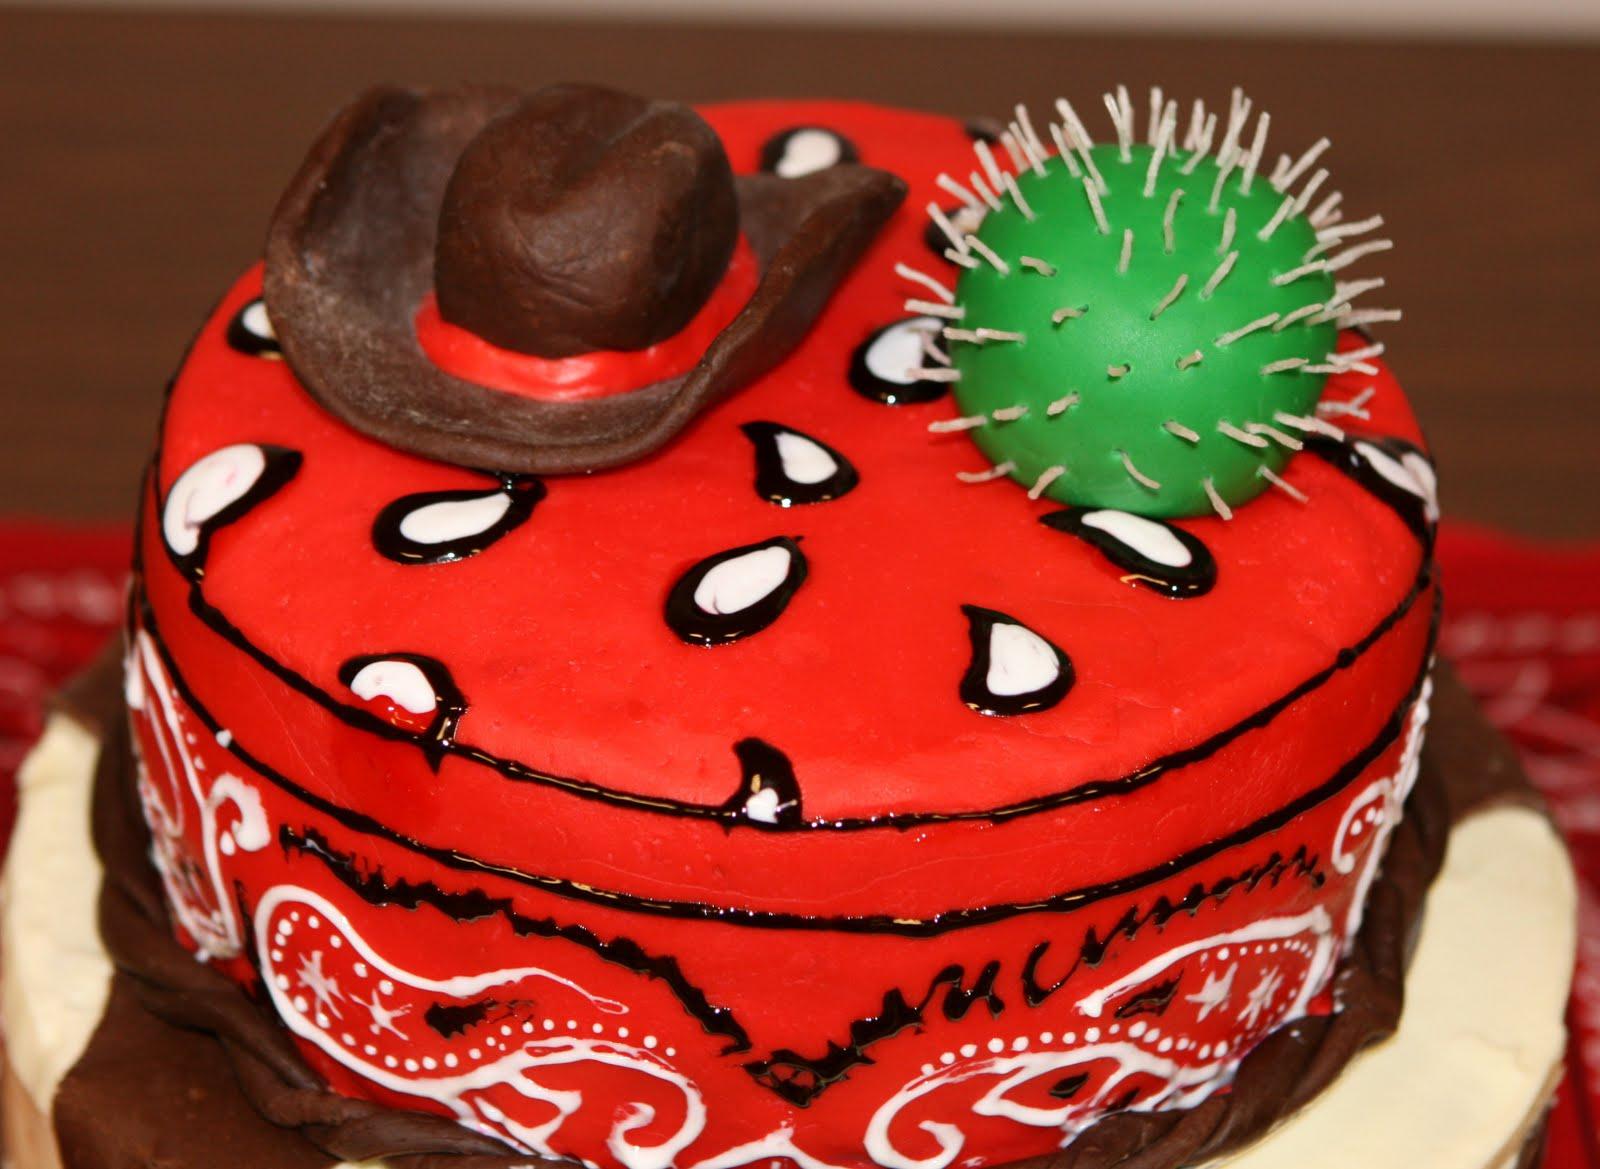 J's Cakes: Western Cake